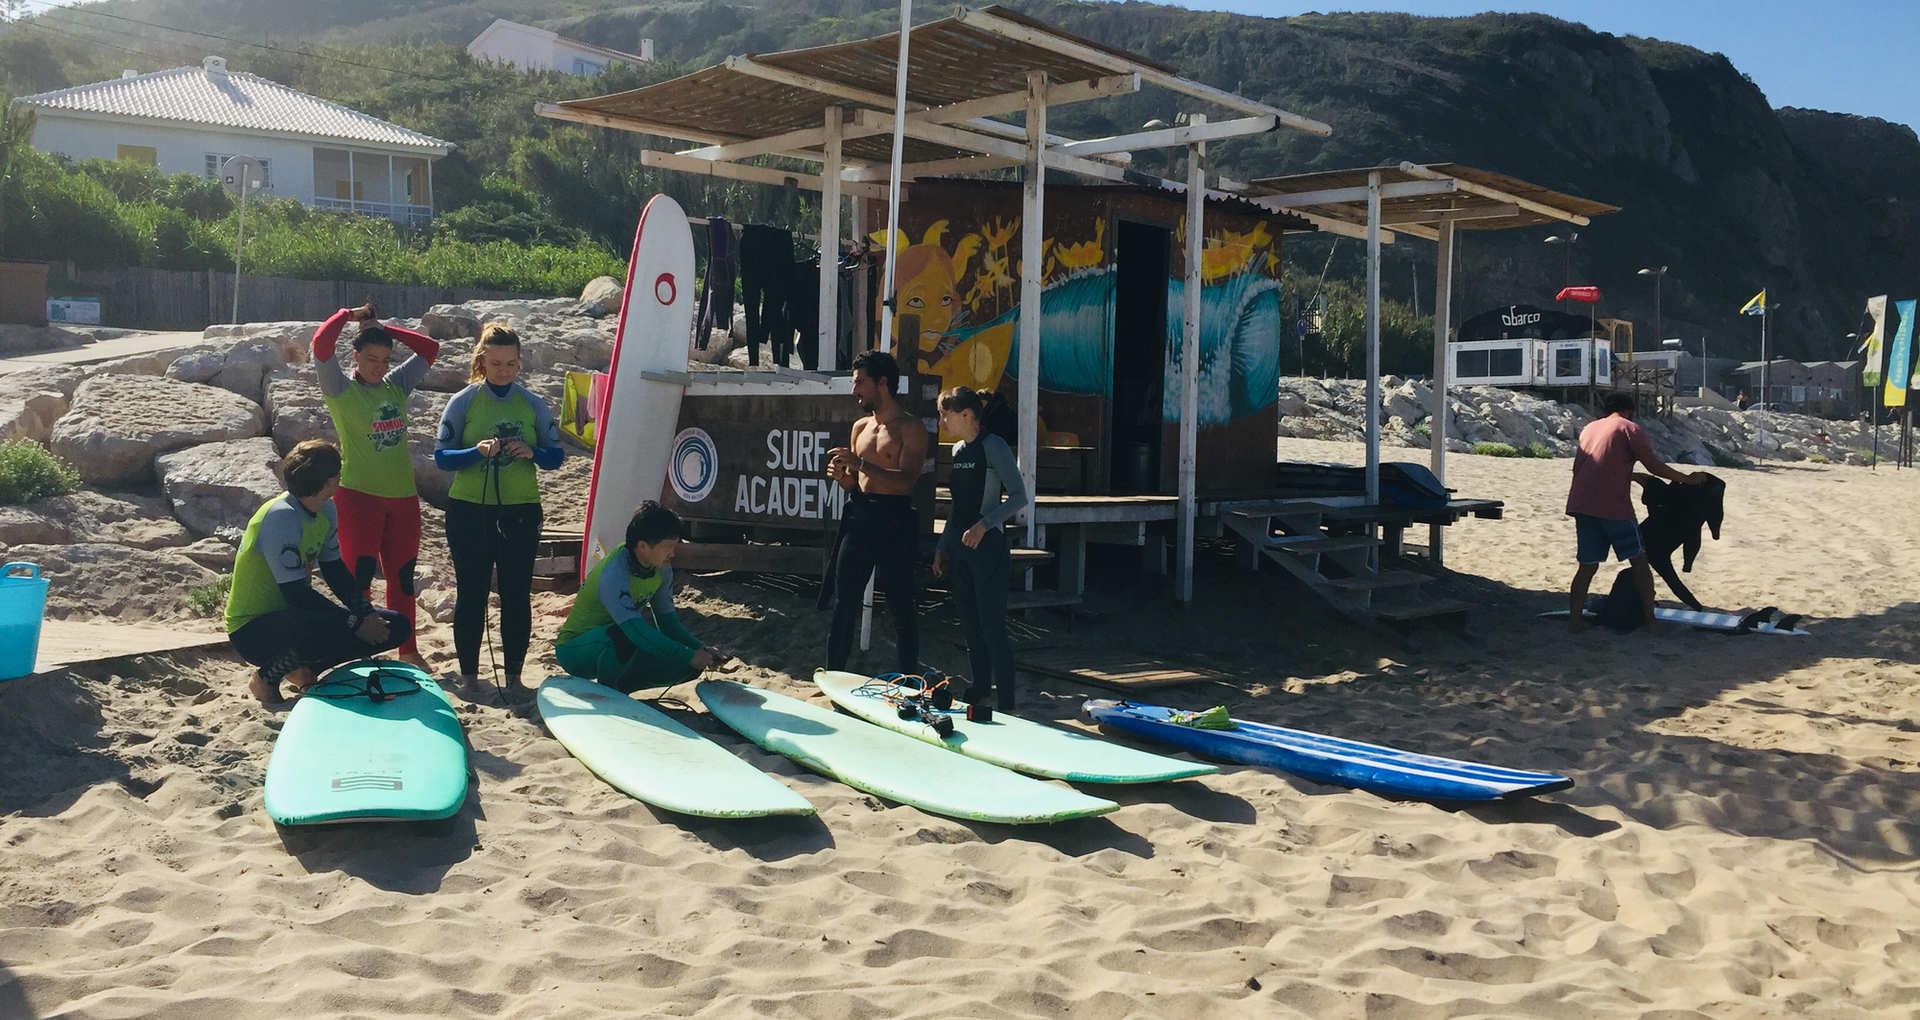 Surf Academy Praia Grande Sintra